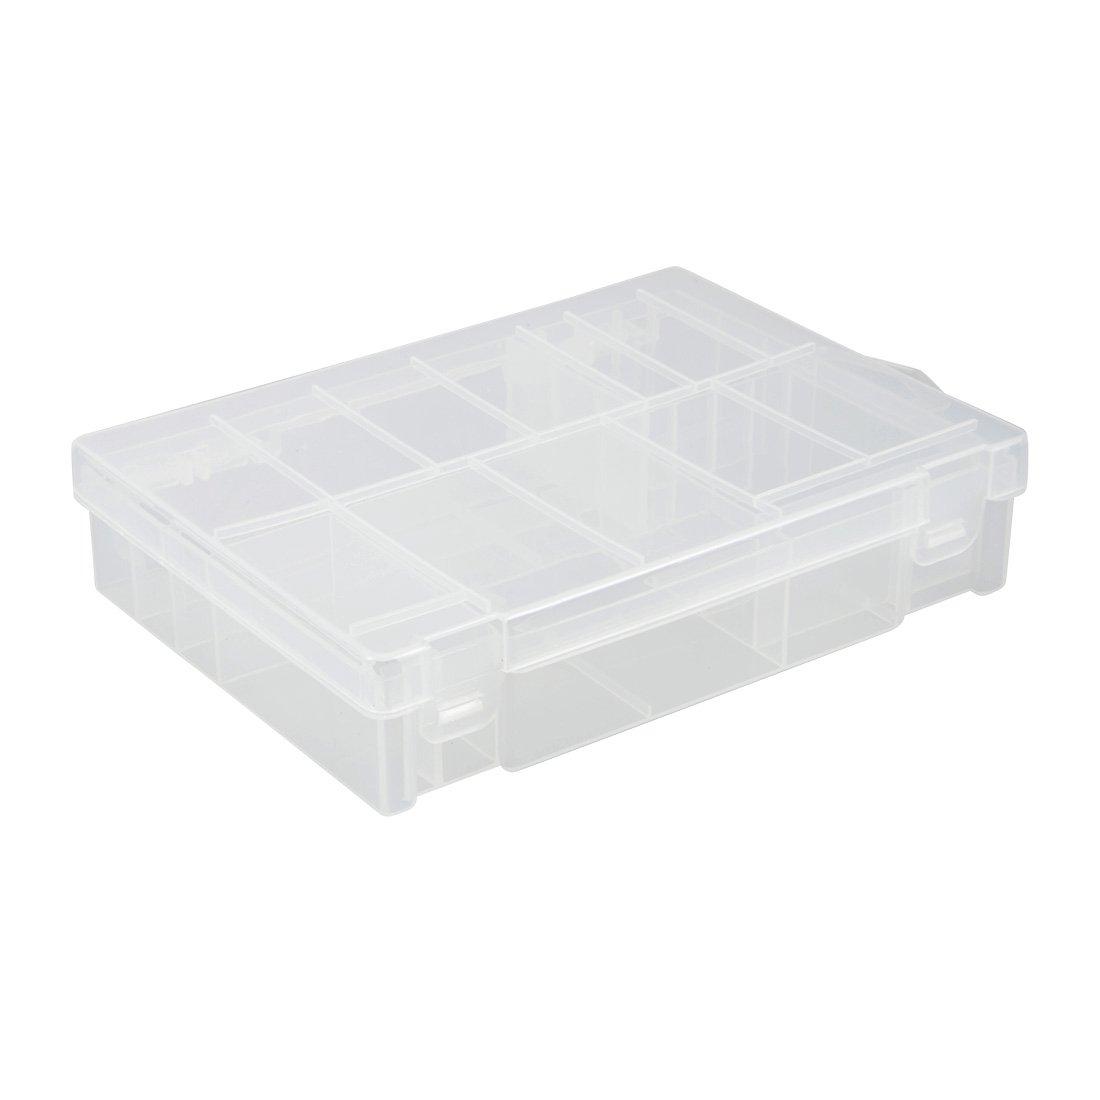 sourcing map Portapilas Compartimentos Estuche de Plástico Transparente Caja de Almacenamiento de Baterías AA/AAA/C/D: Amazon.es: Electrónica